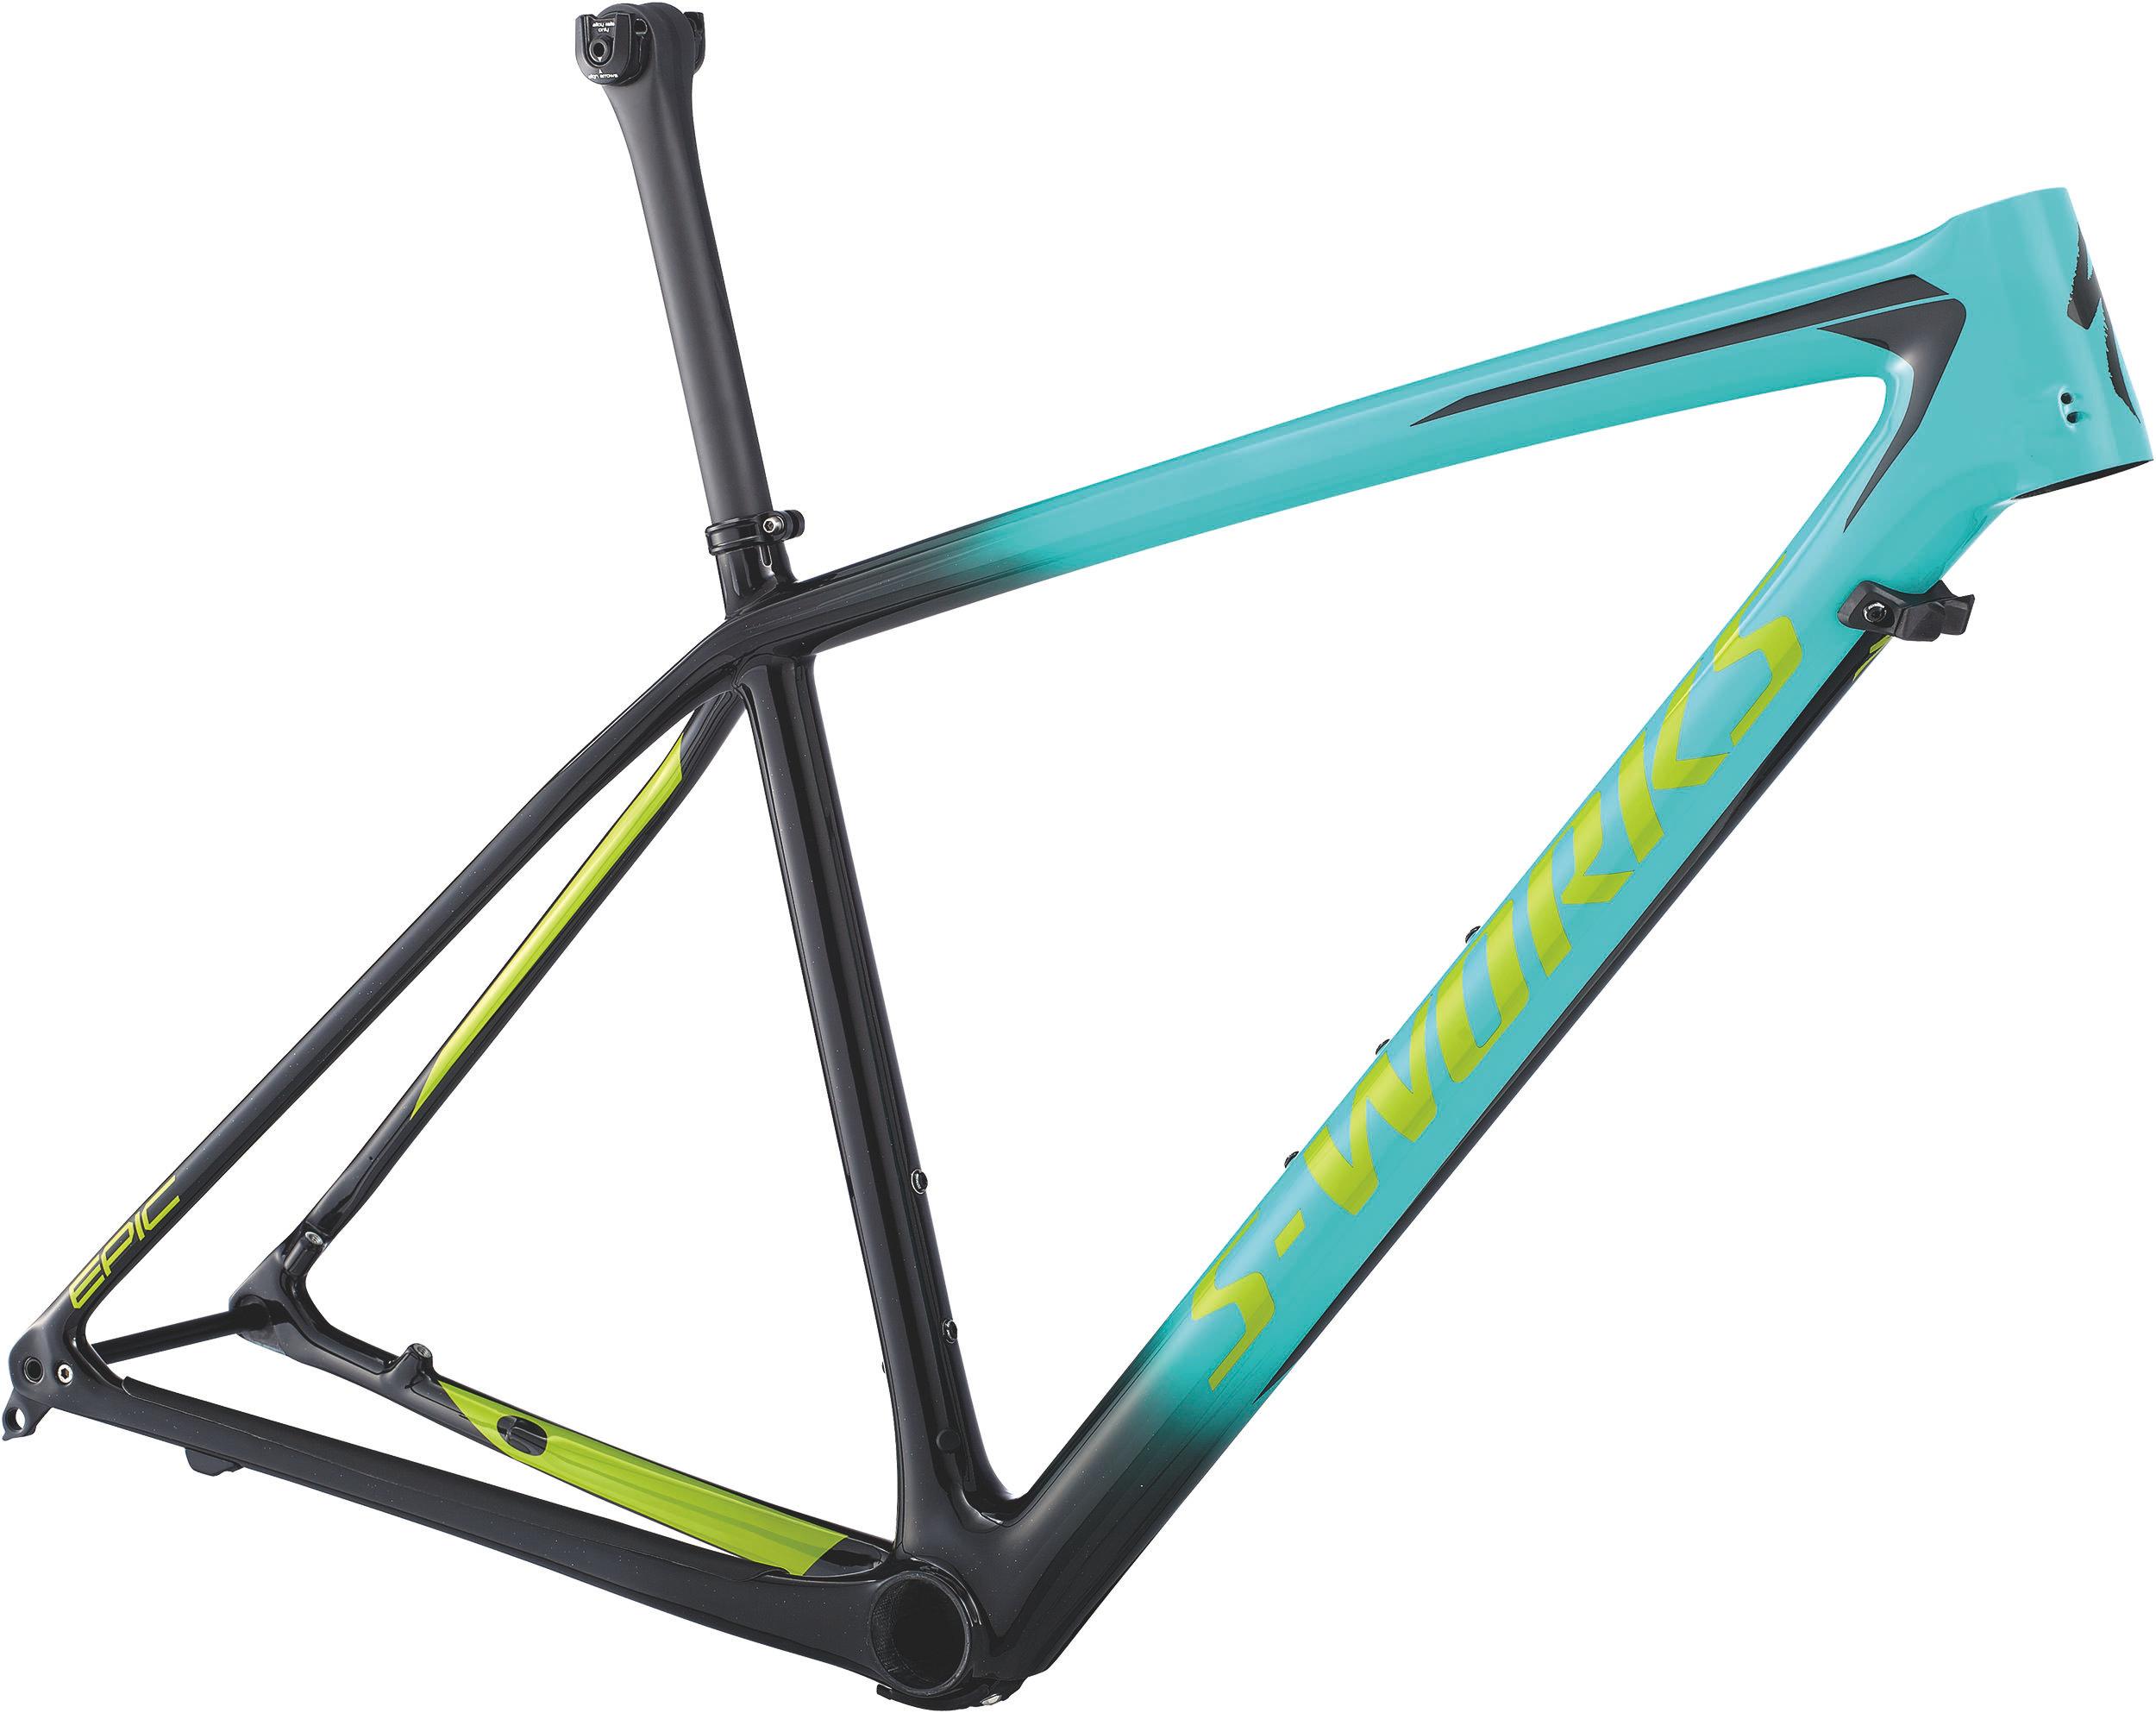 Specialized Men´s S-Works Epic Hardtail Frame GLOSS ACID MINT / COSMIC BLACK / HYPER GREEN L - Bike Zone